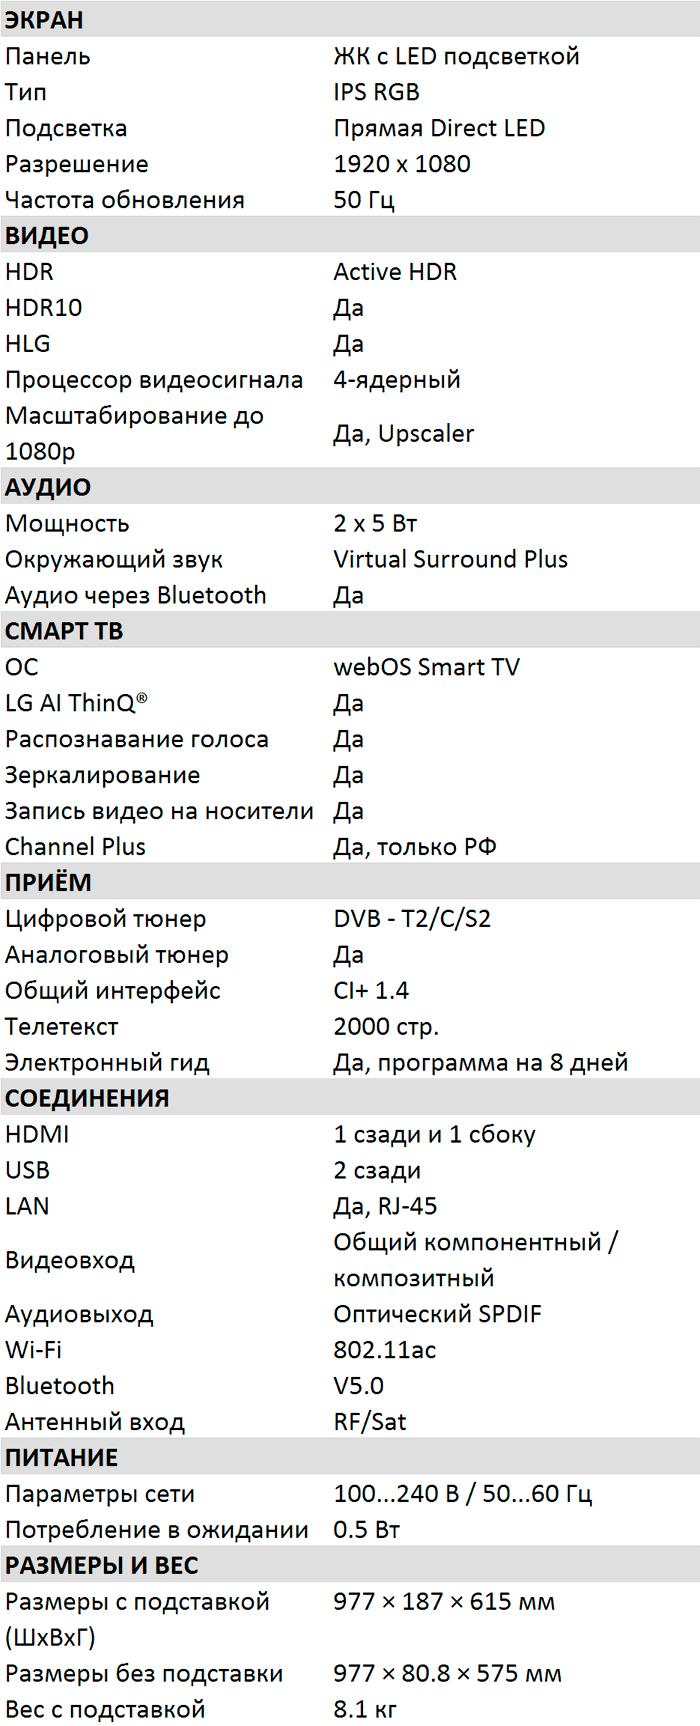 Характеристики 43LM5700